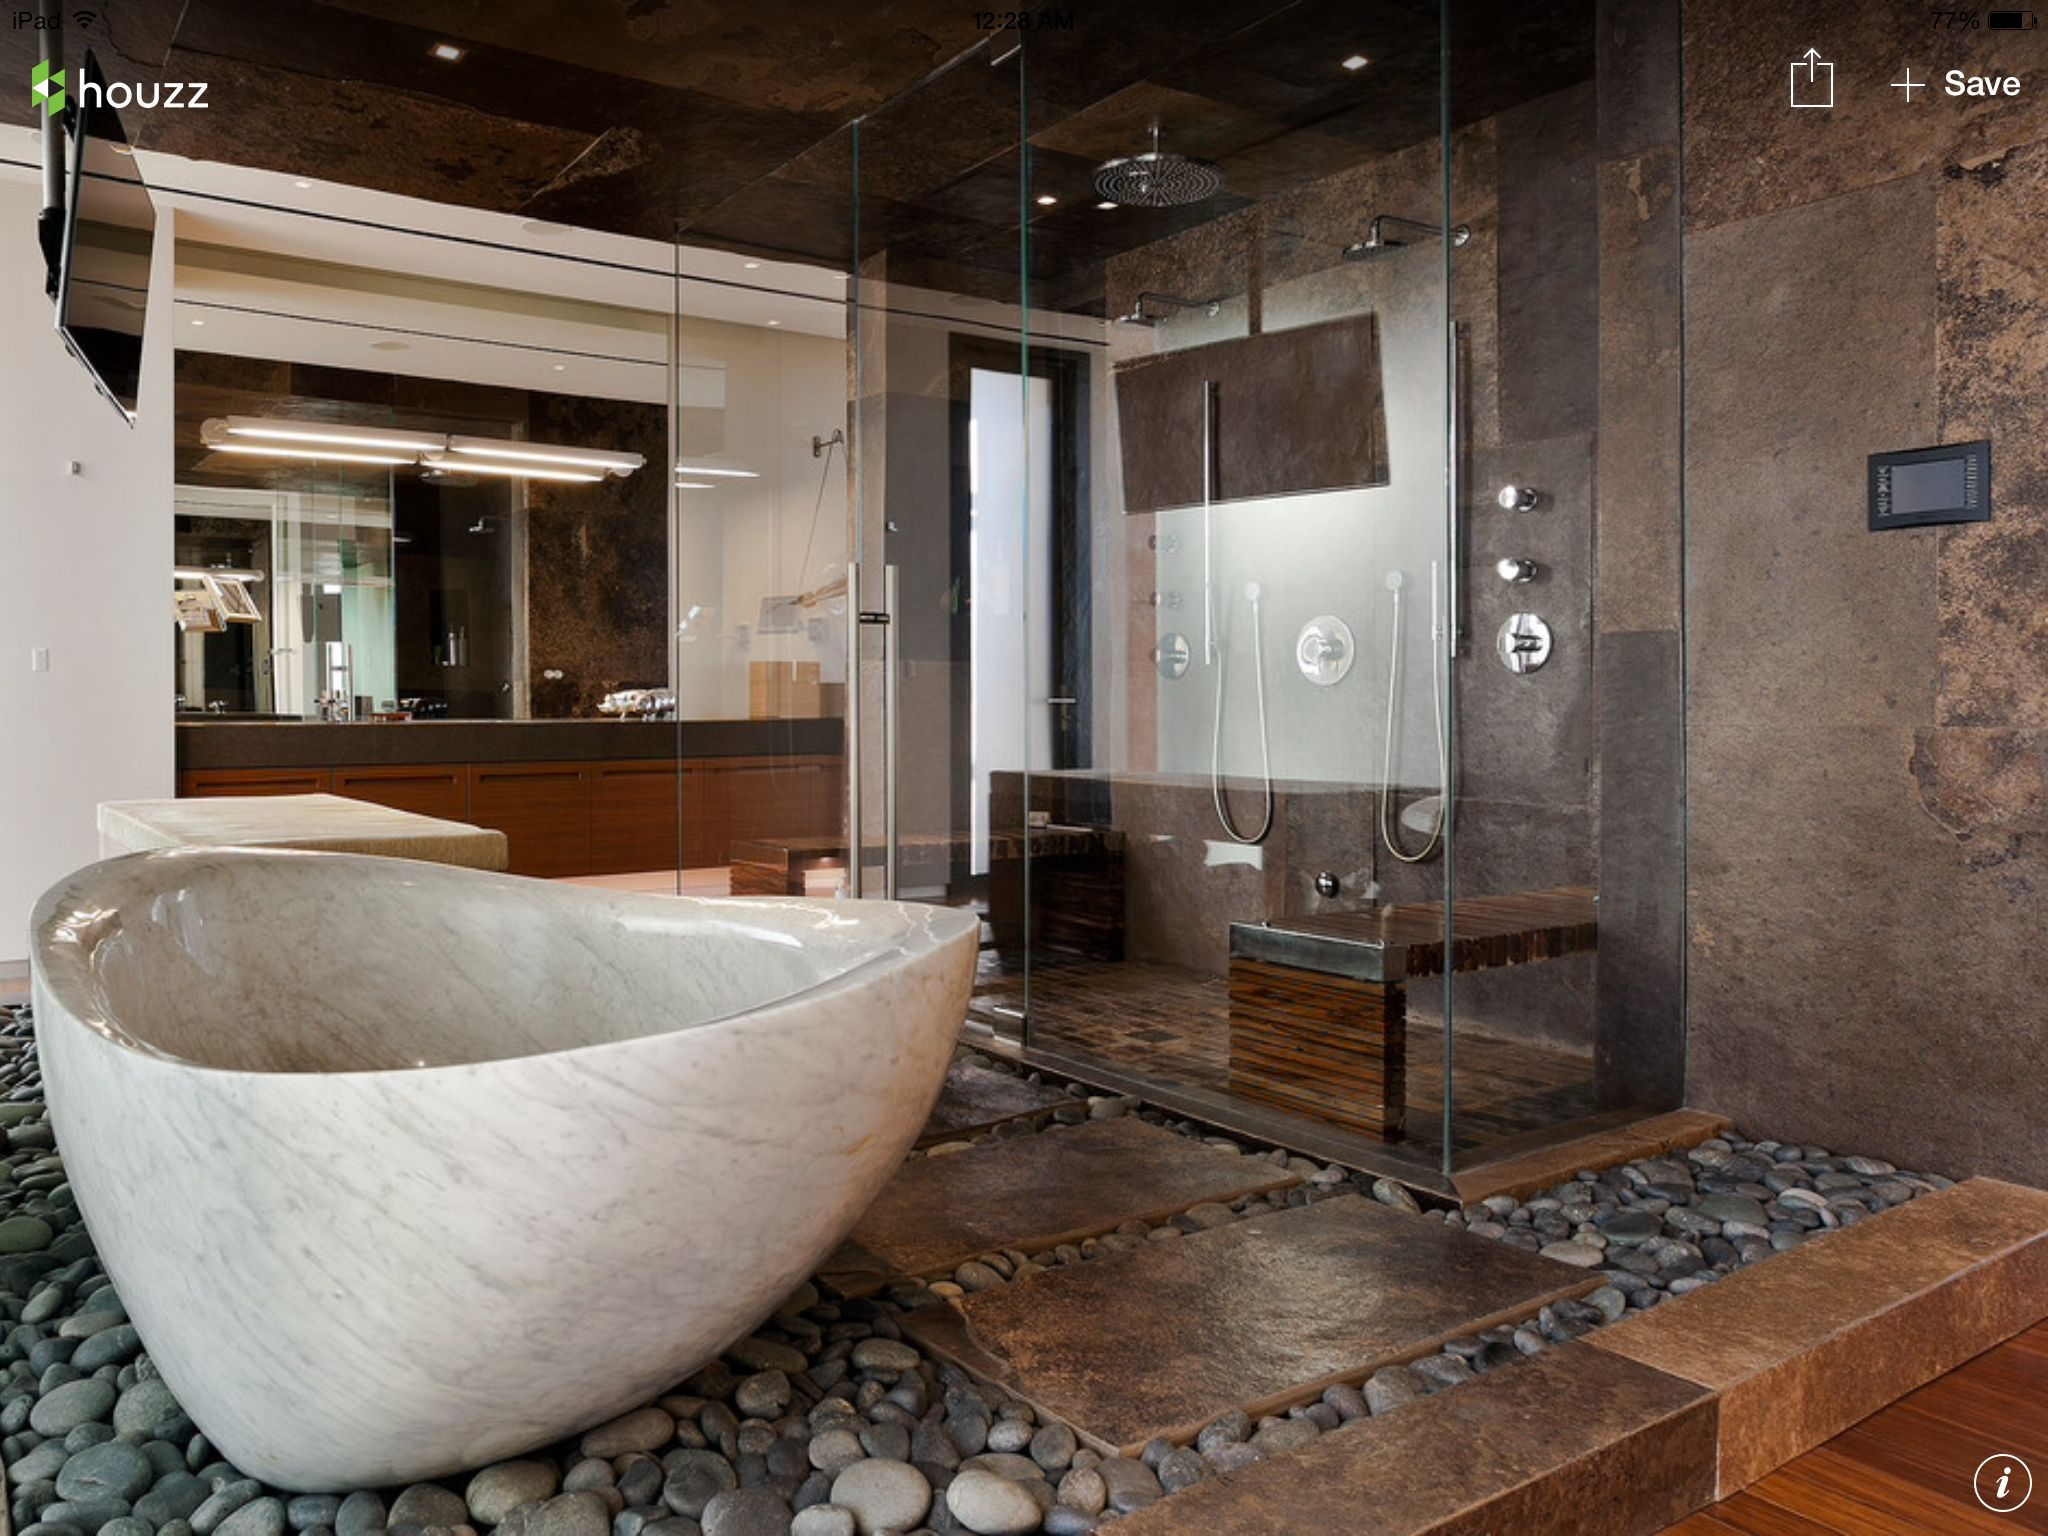 Spa like master bathroom Rock & Marble bathtubs